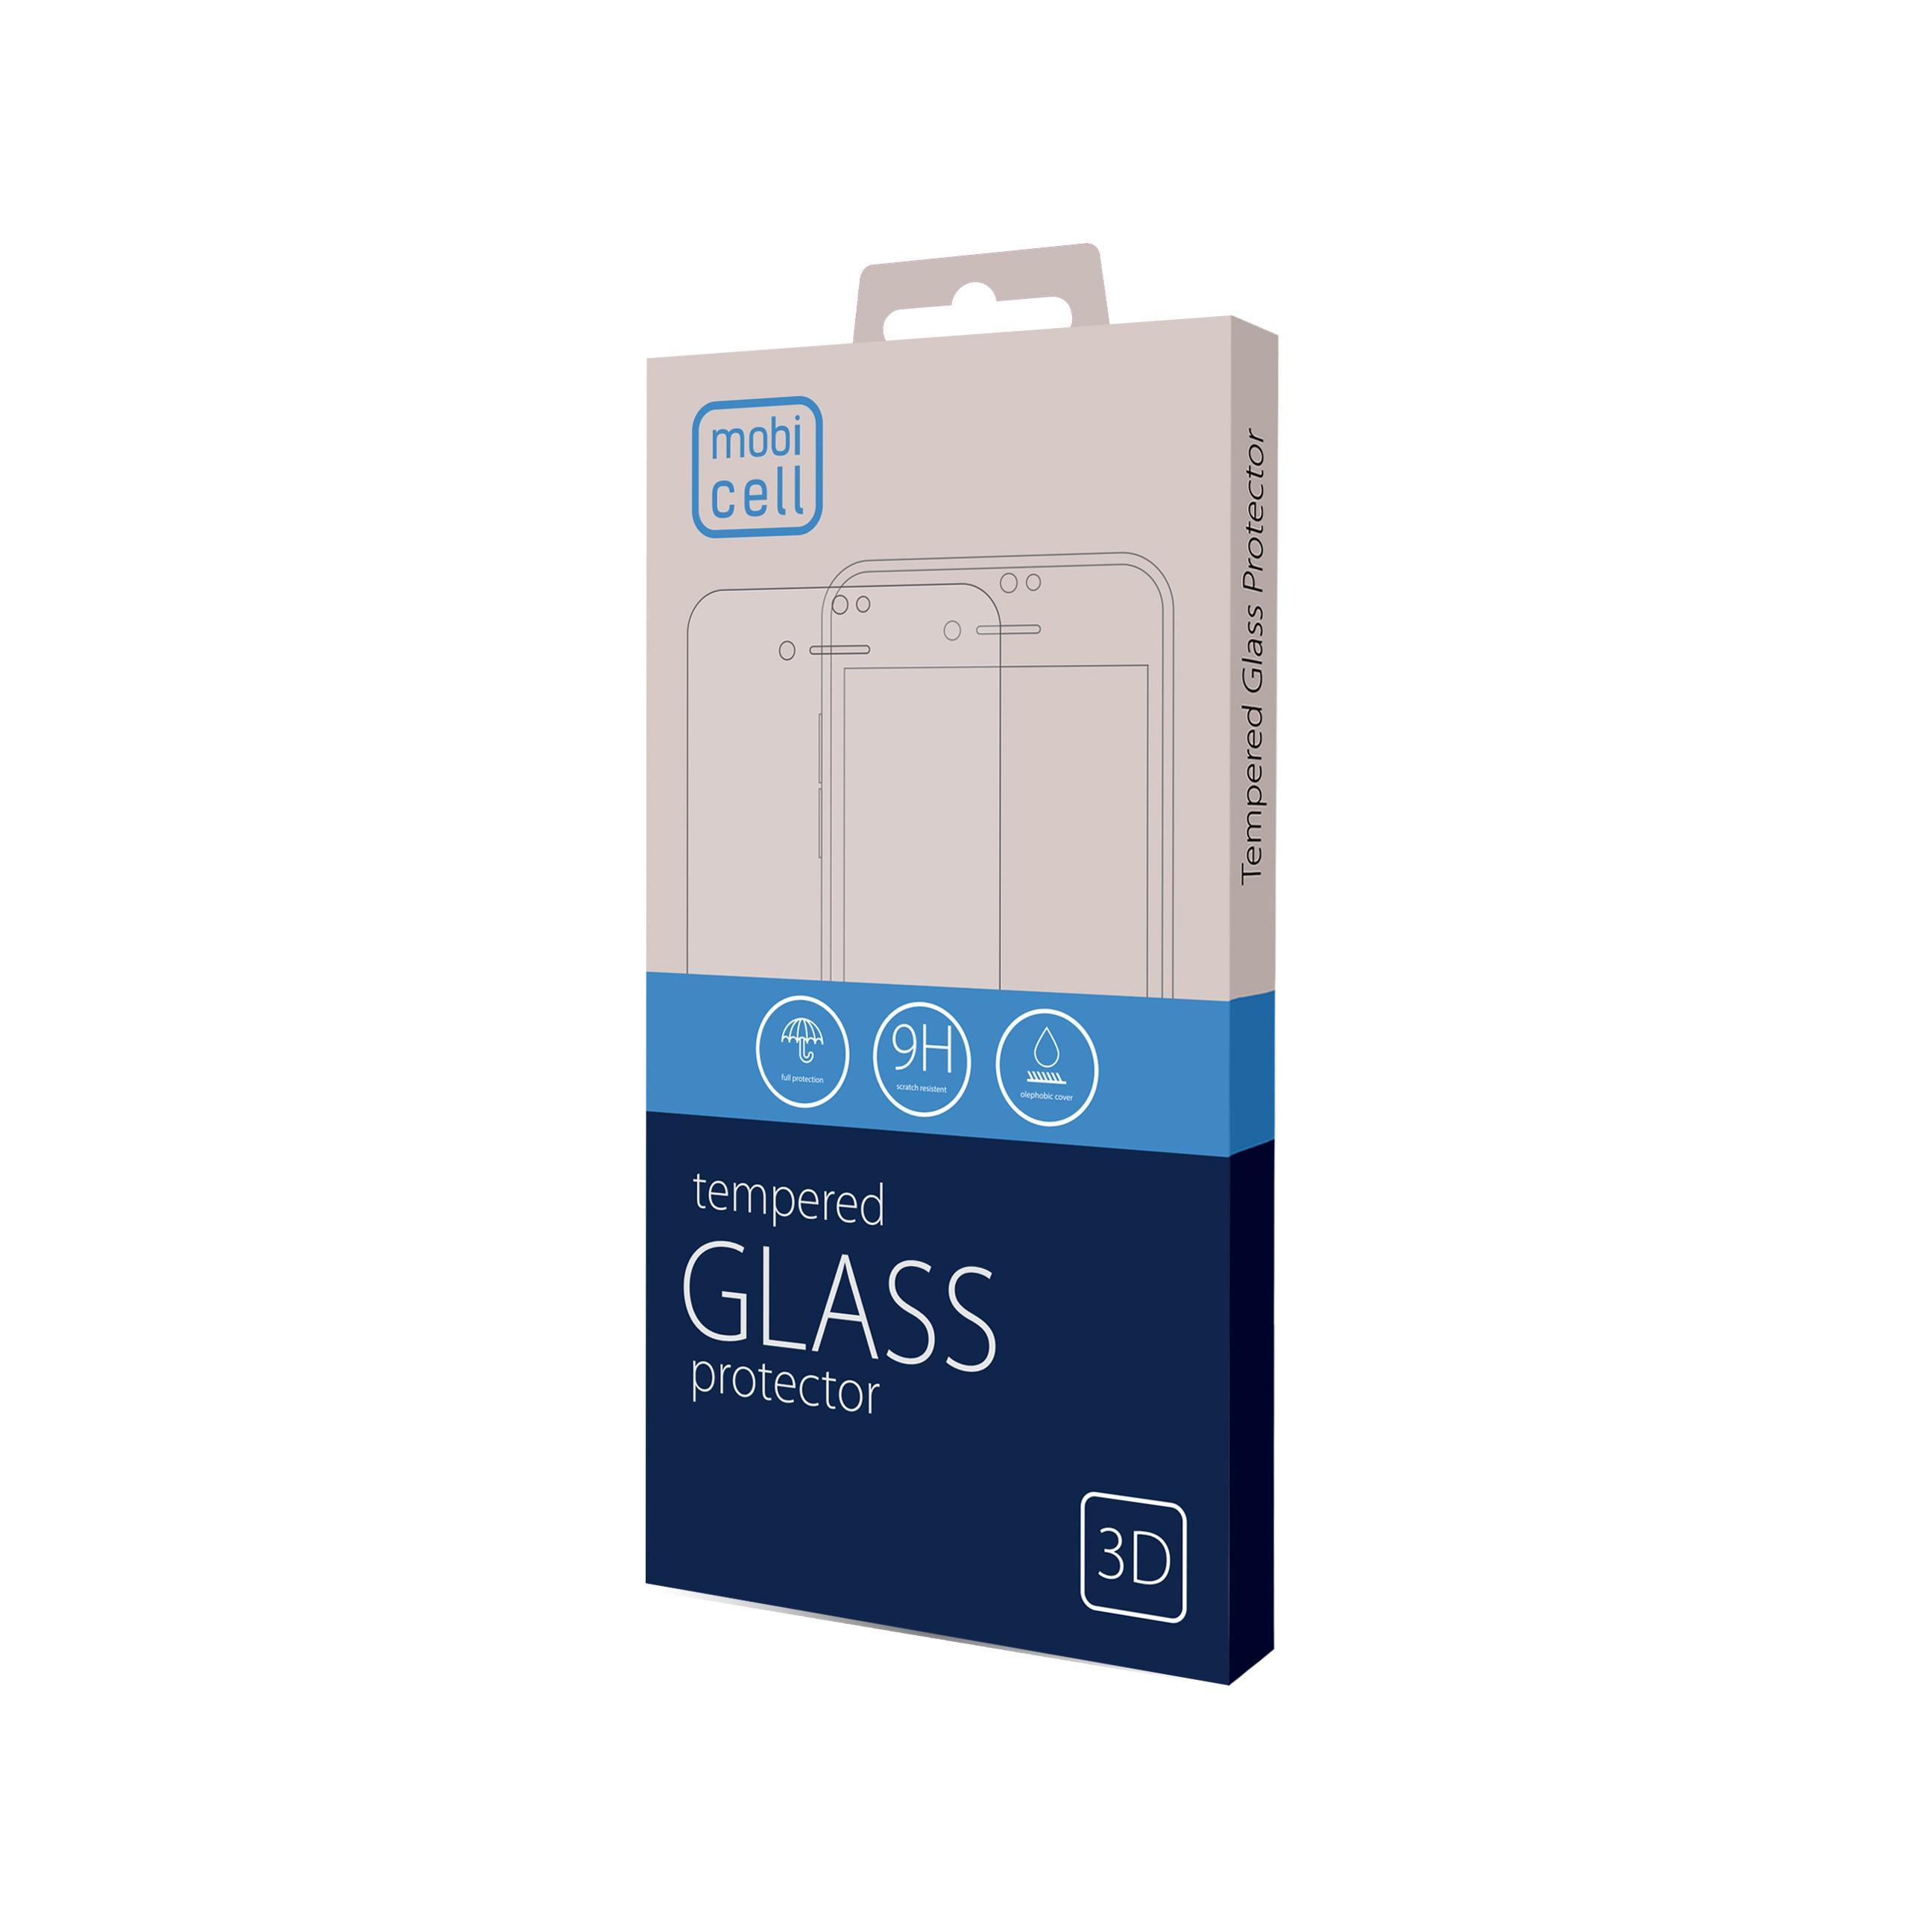 Folie protectie 3d full cover pentru iphone 12 pro max - negru